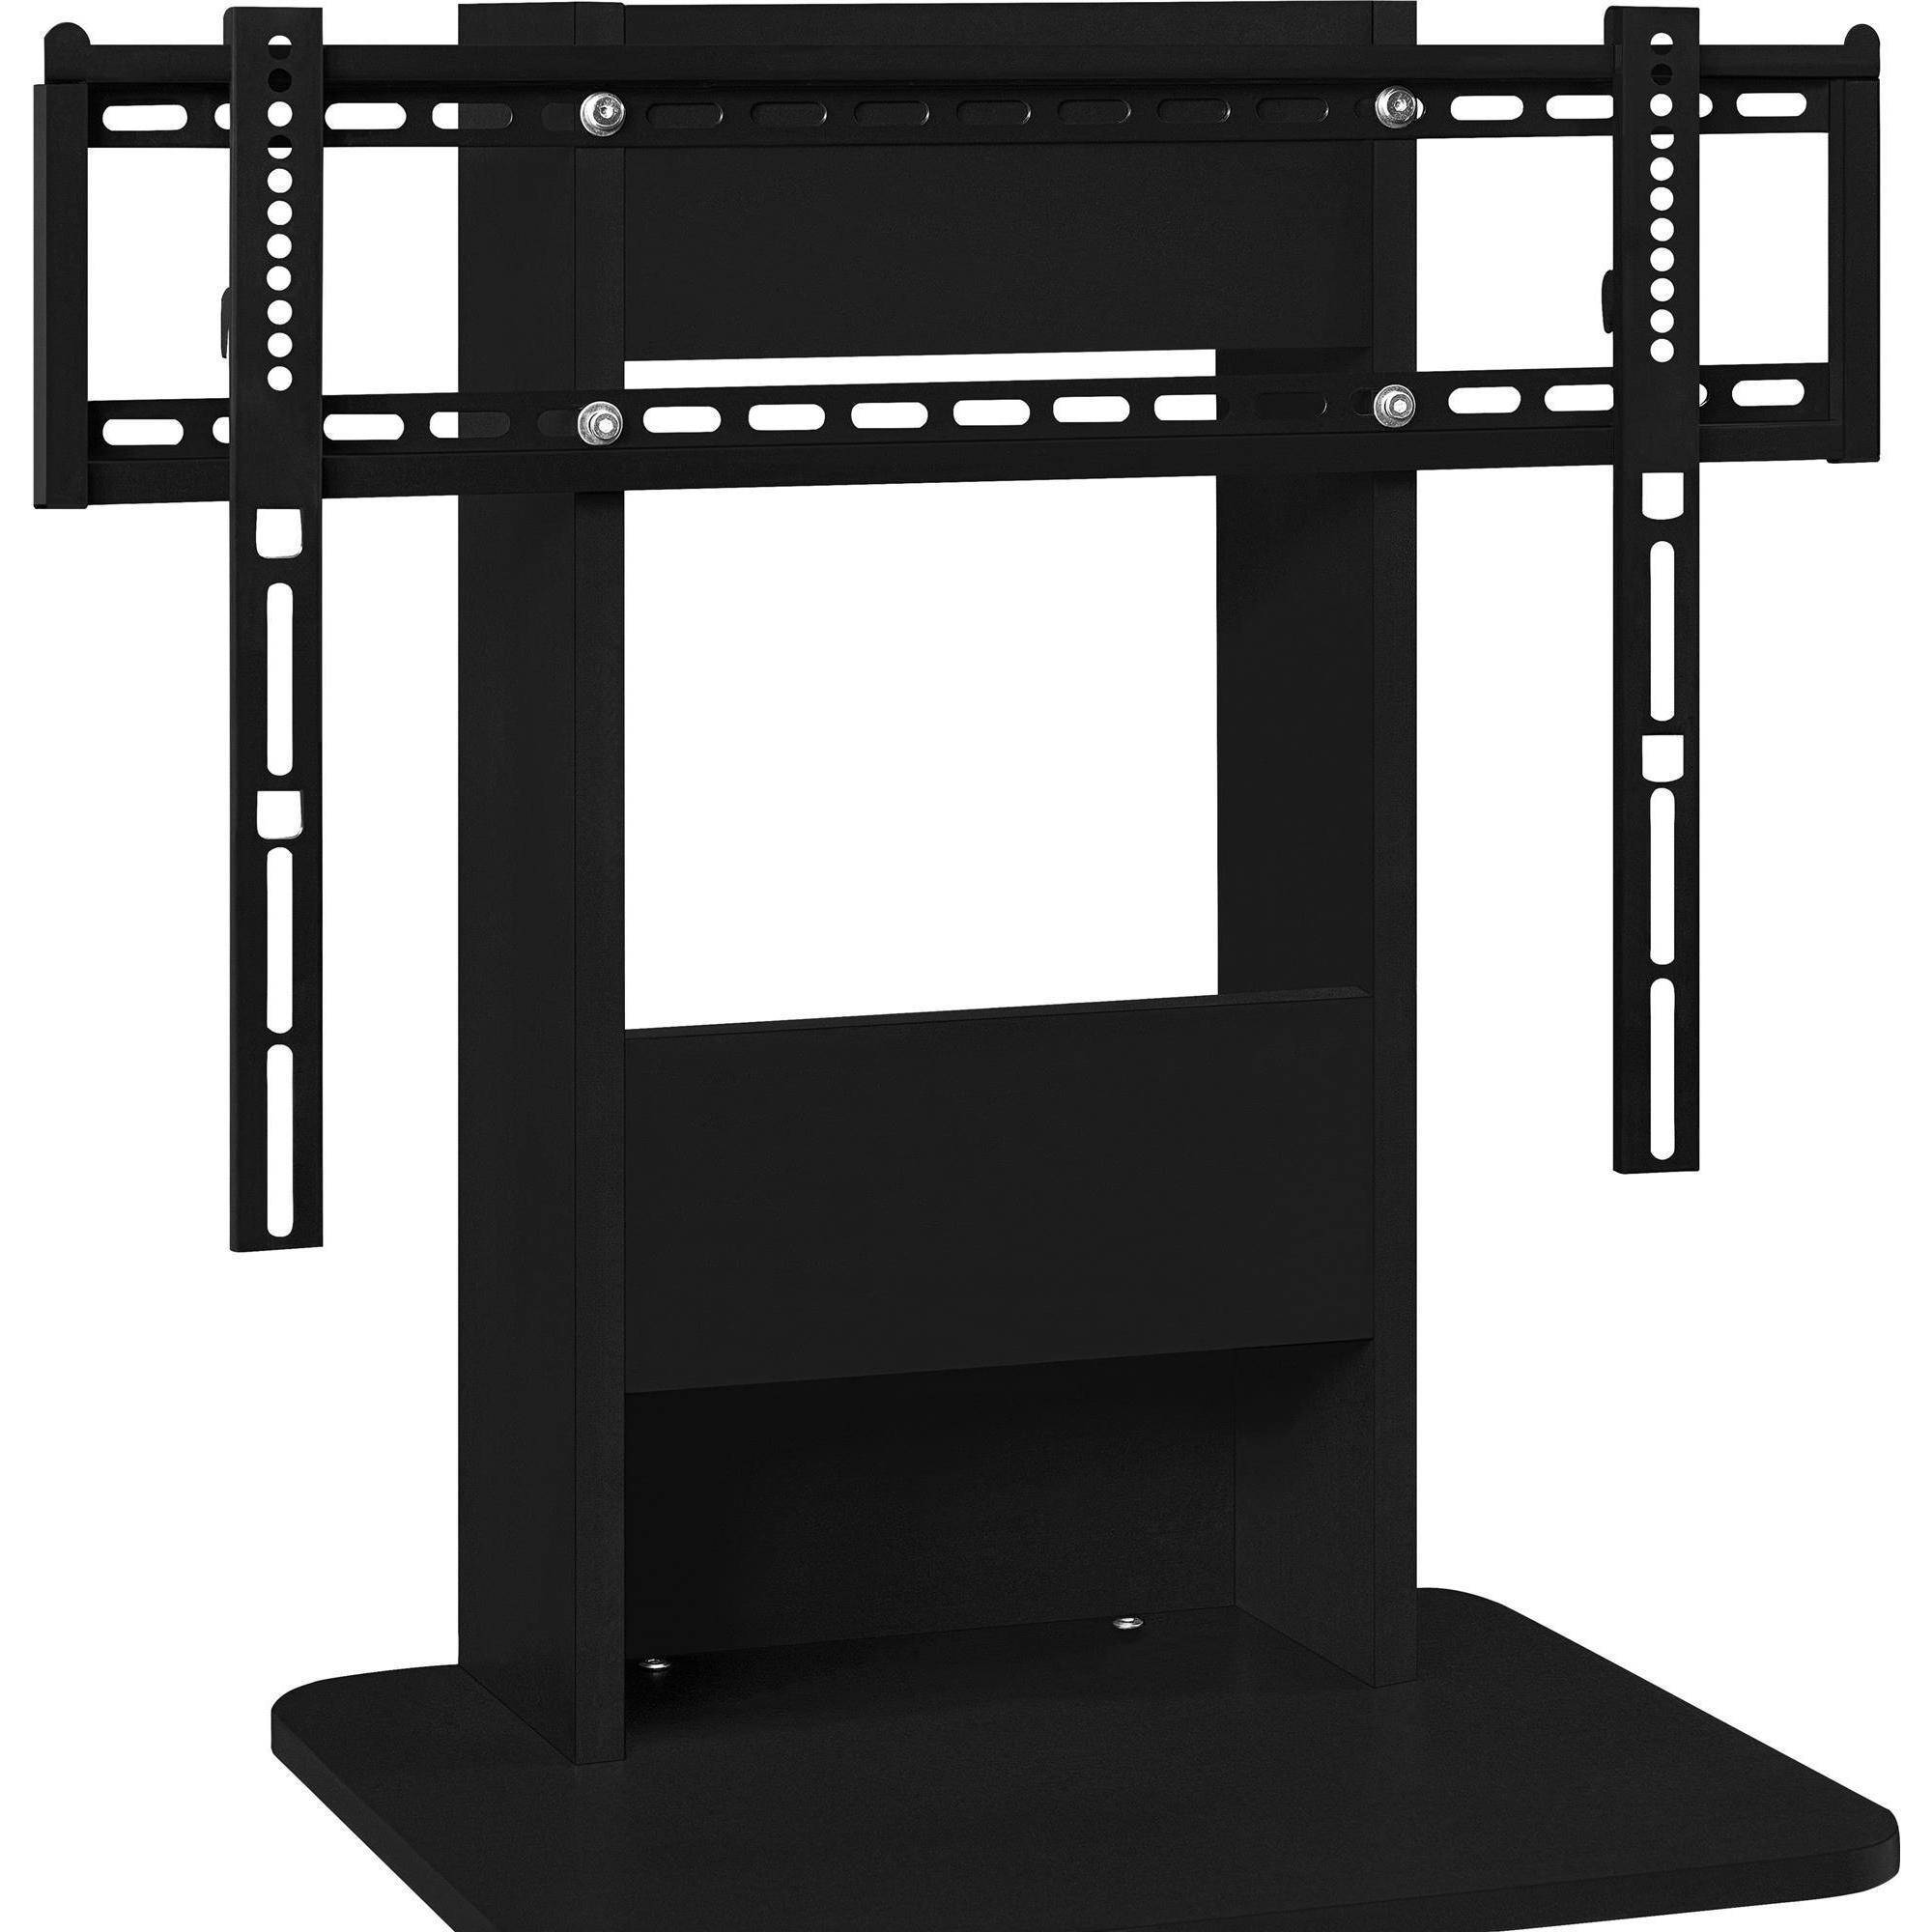 large entertainment center corner 65 inch tall 70 tv stand 55 best heavy dut ebay. Black Bedroom Furniture Sets. Home Design Ideas